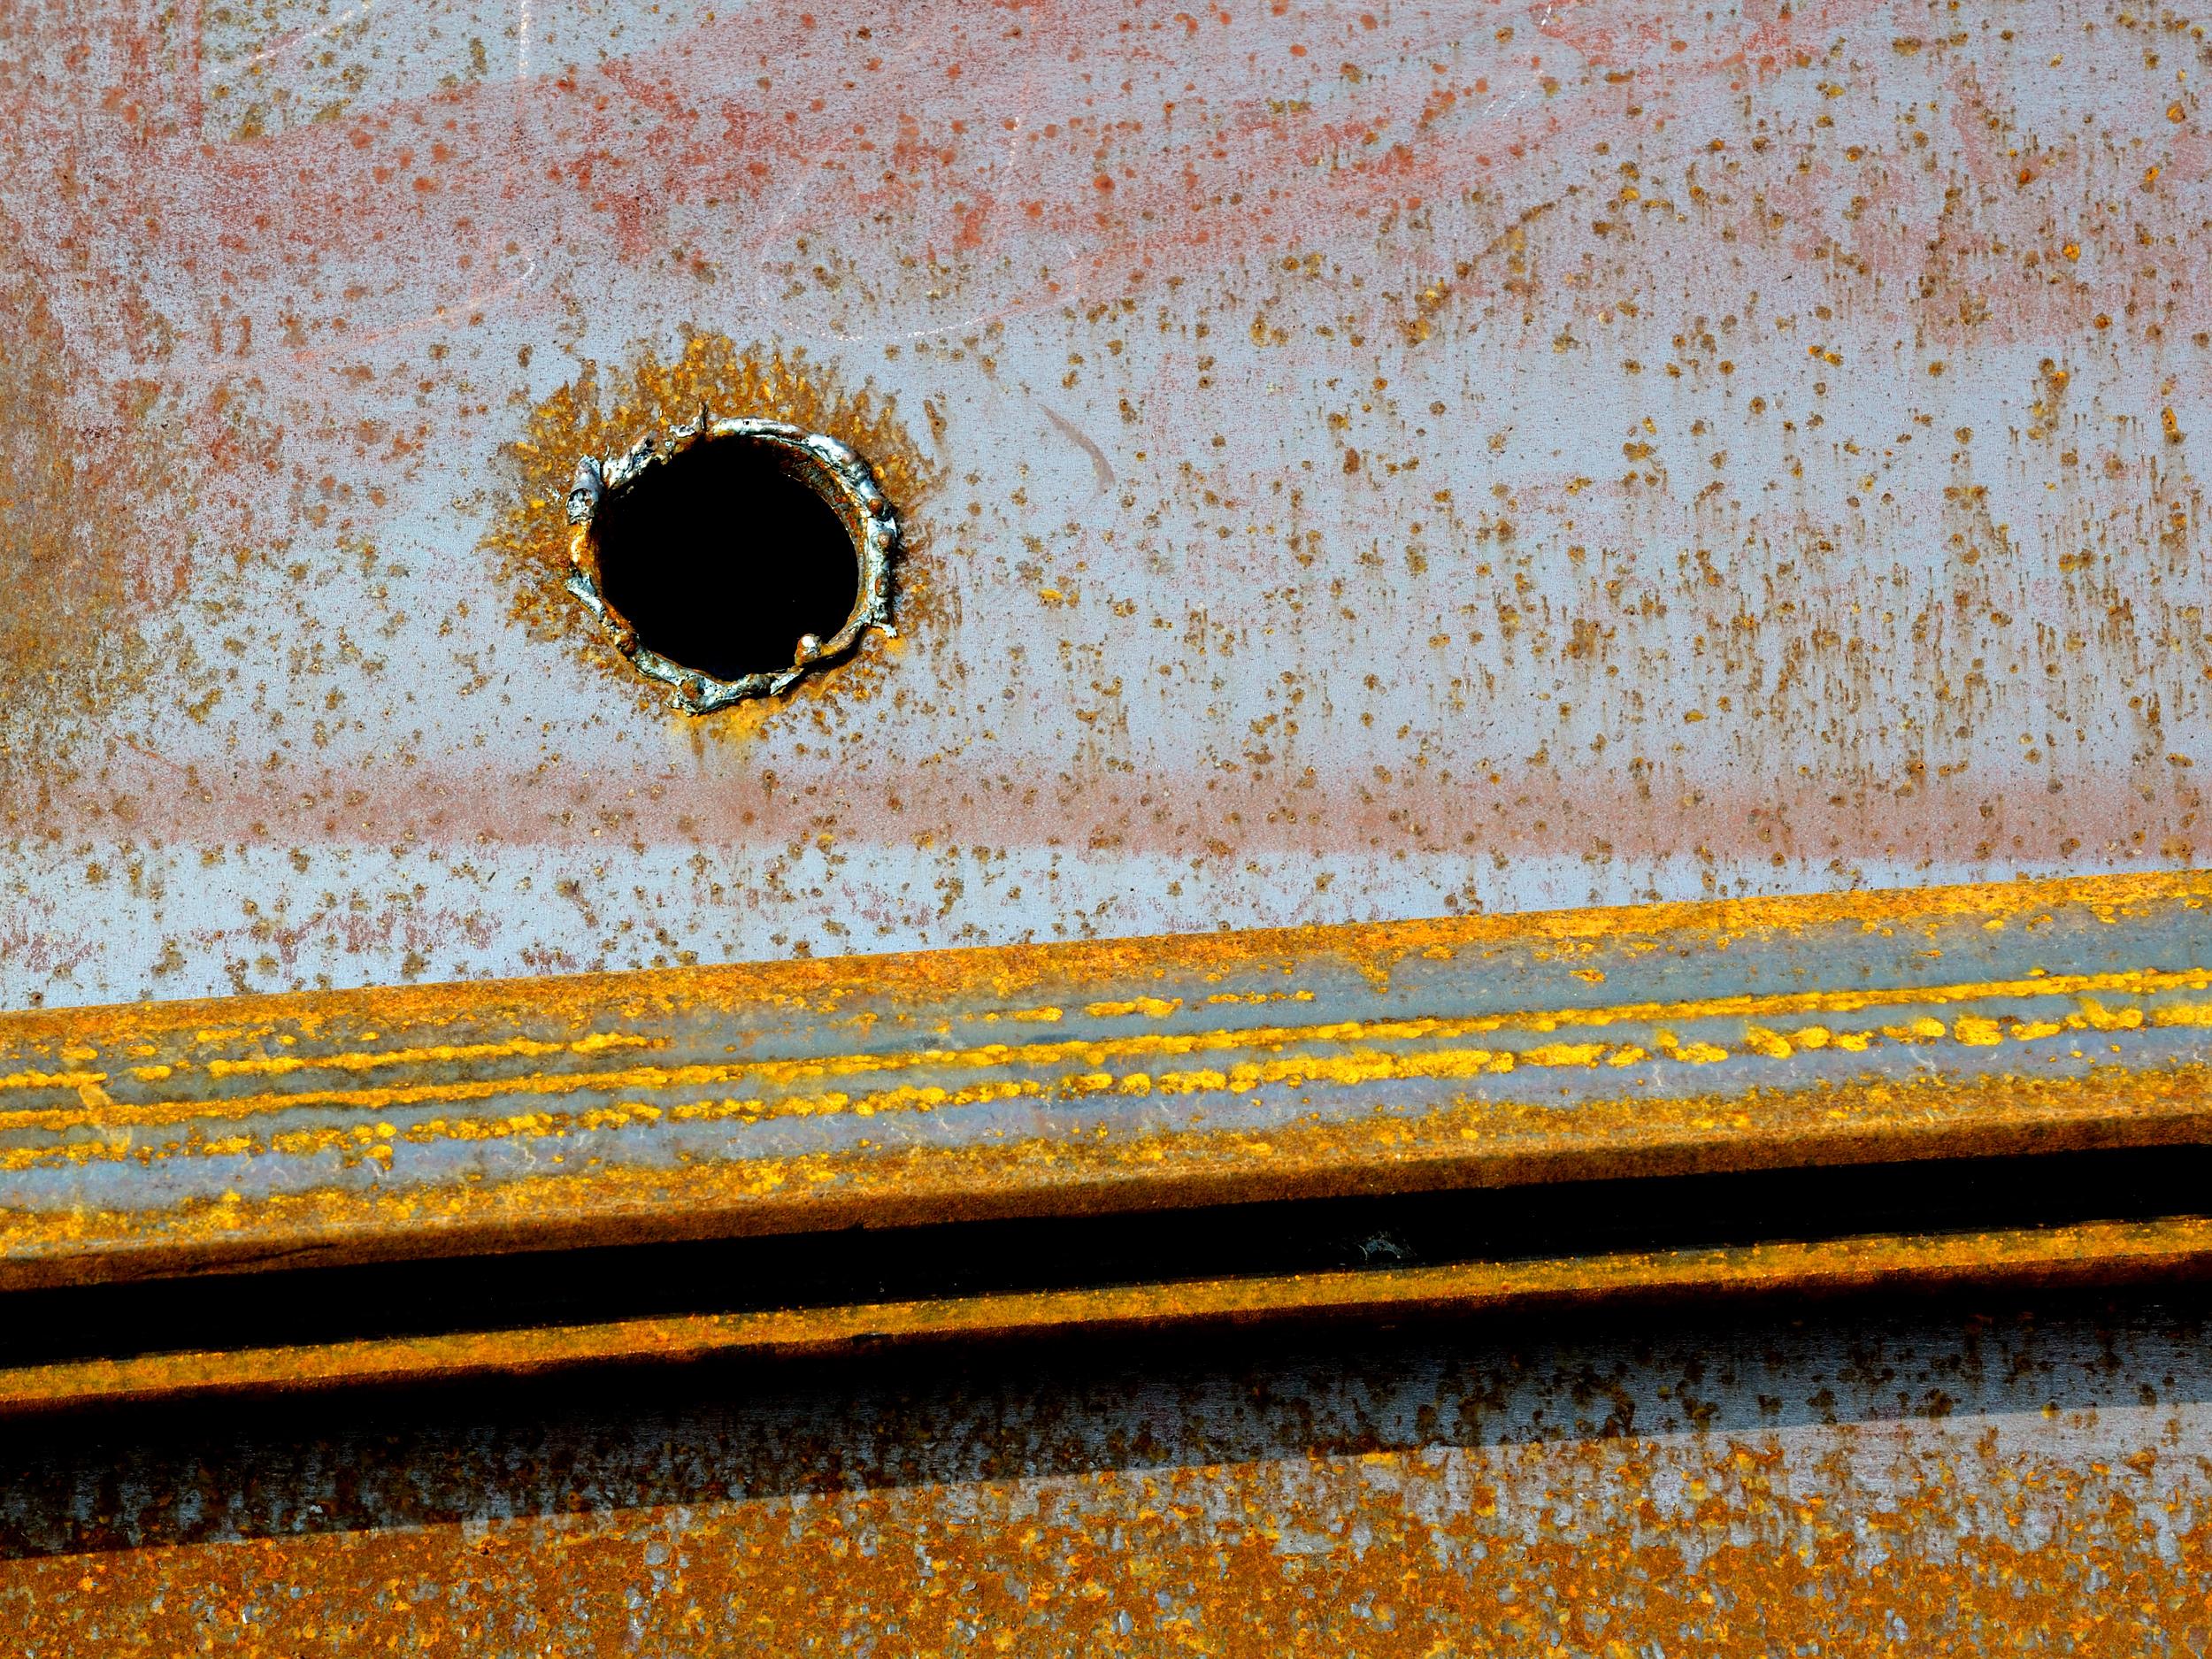 Rusty Hole